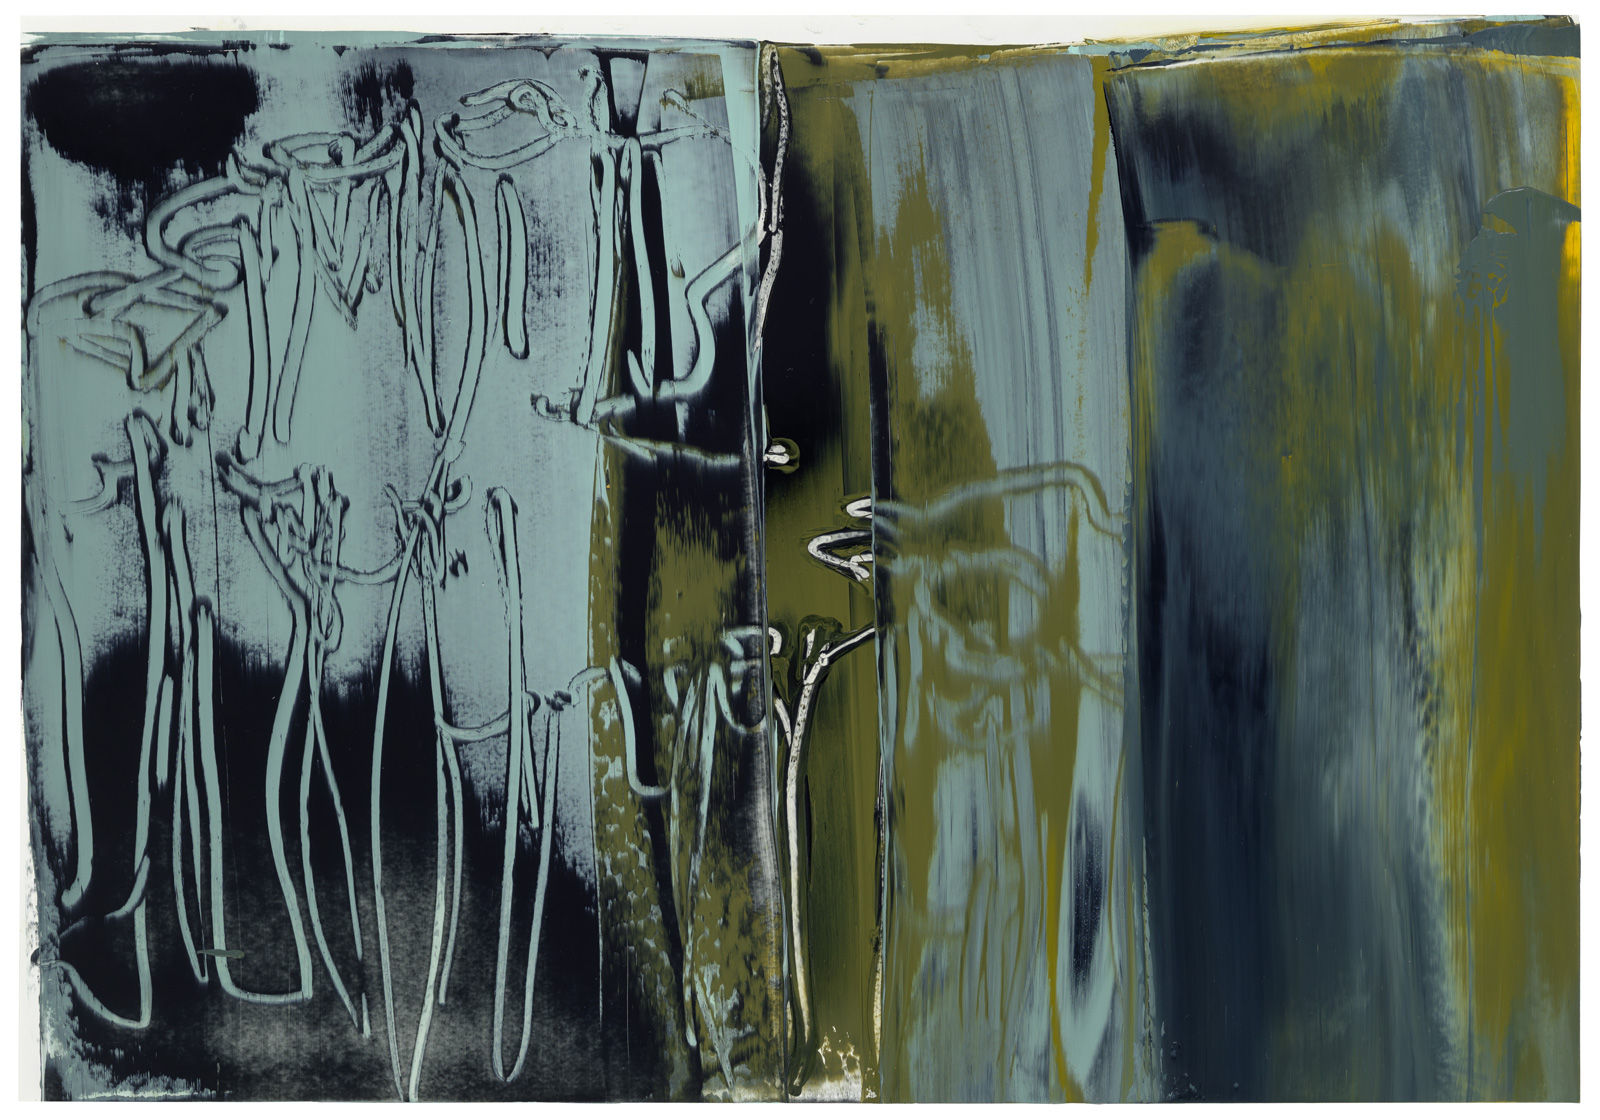 Sepiapfeiler, Öl auf Papier, 36x51cm, 2019